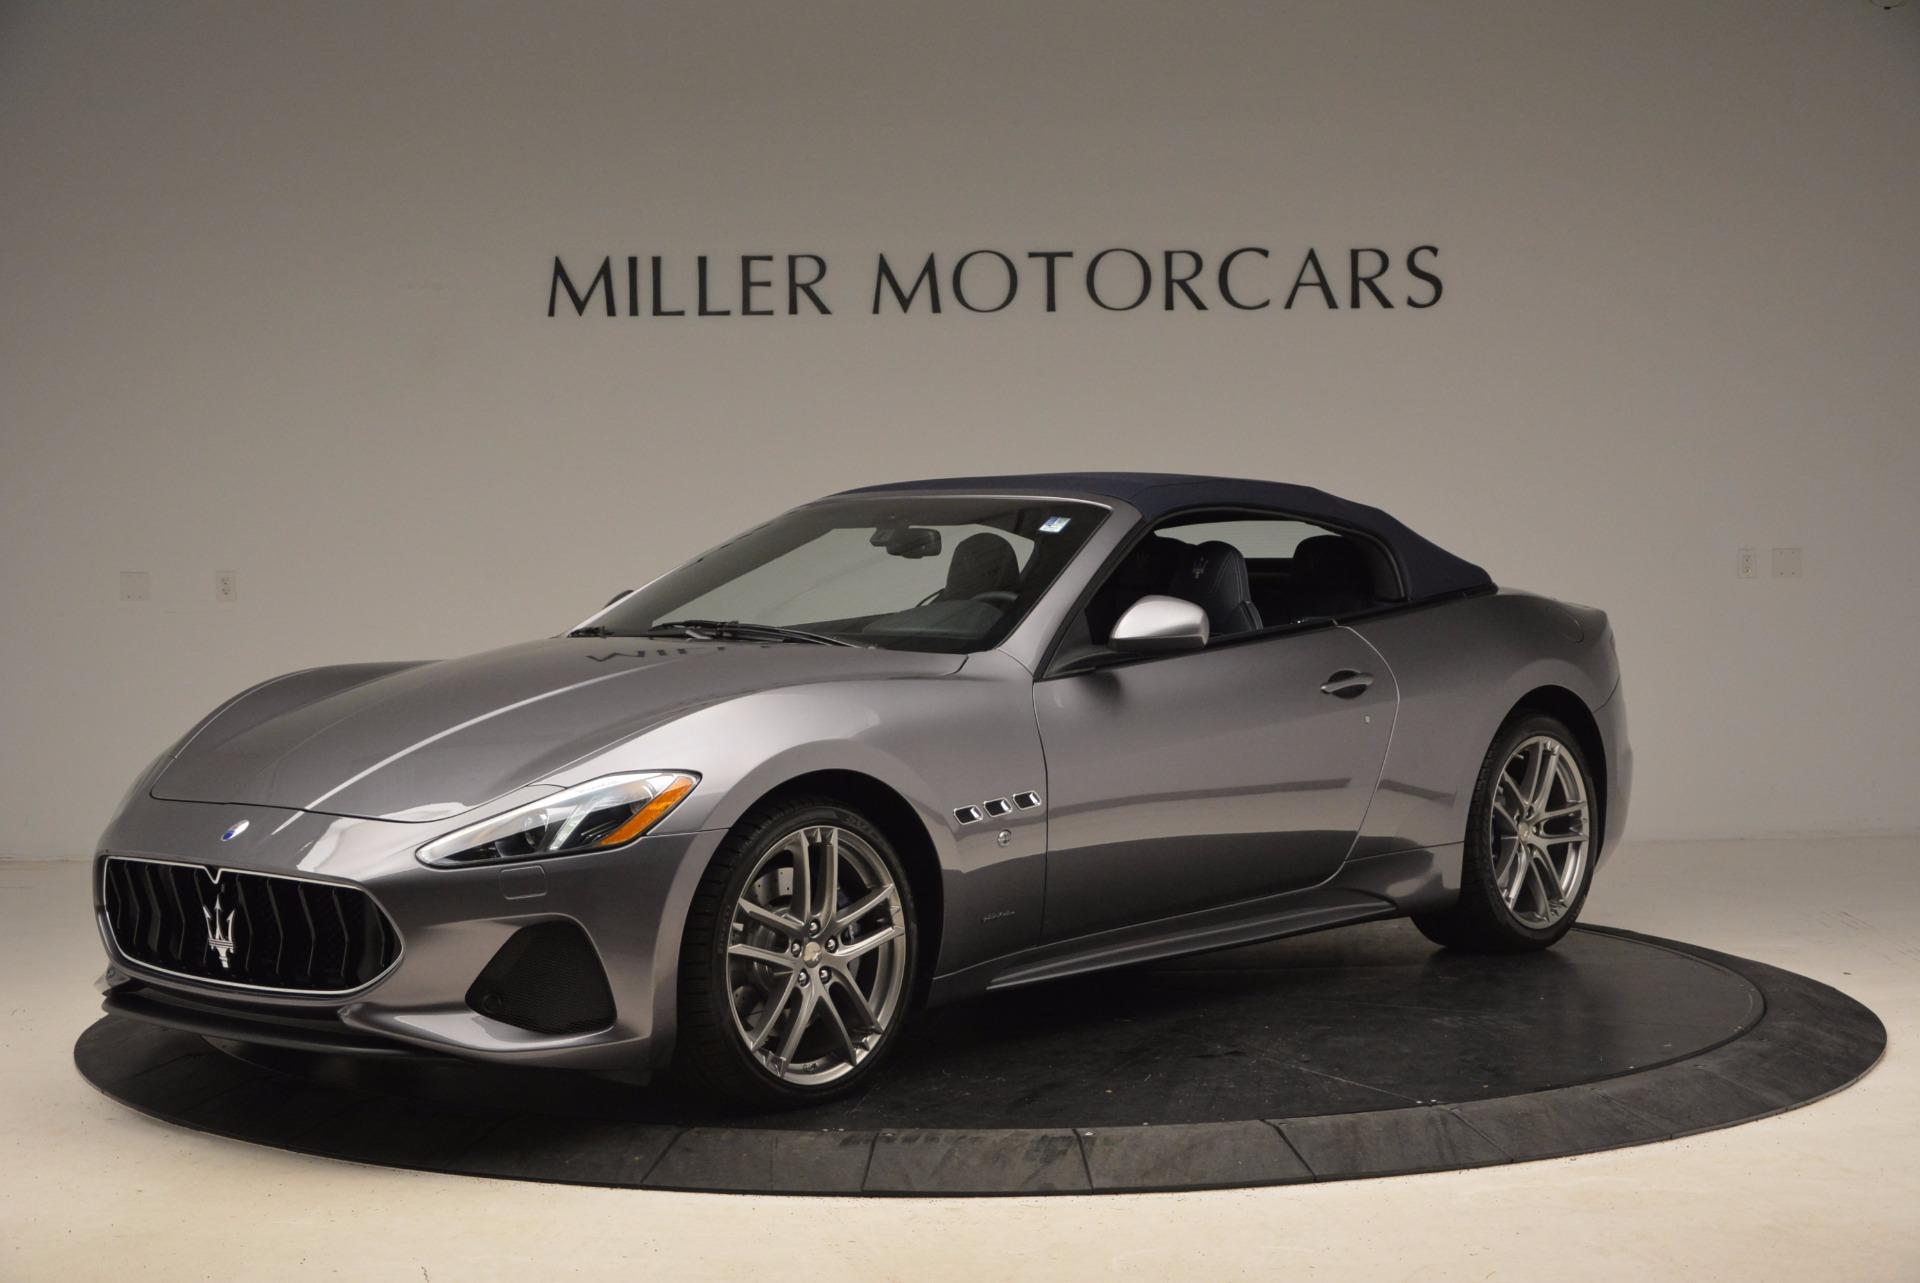 New 2018 Maserati GranTurismo Sport Convertible For Sale In Westport, CT 1703_p4